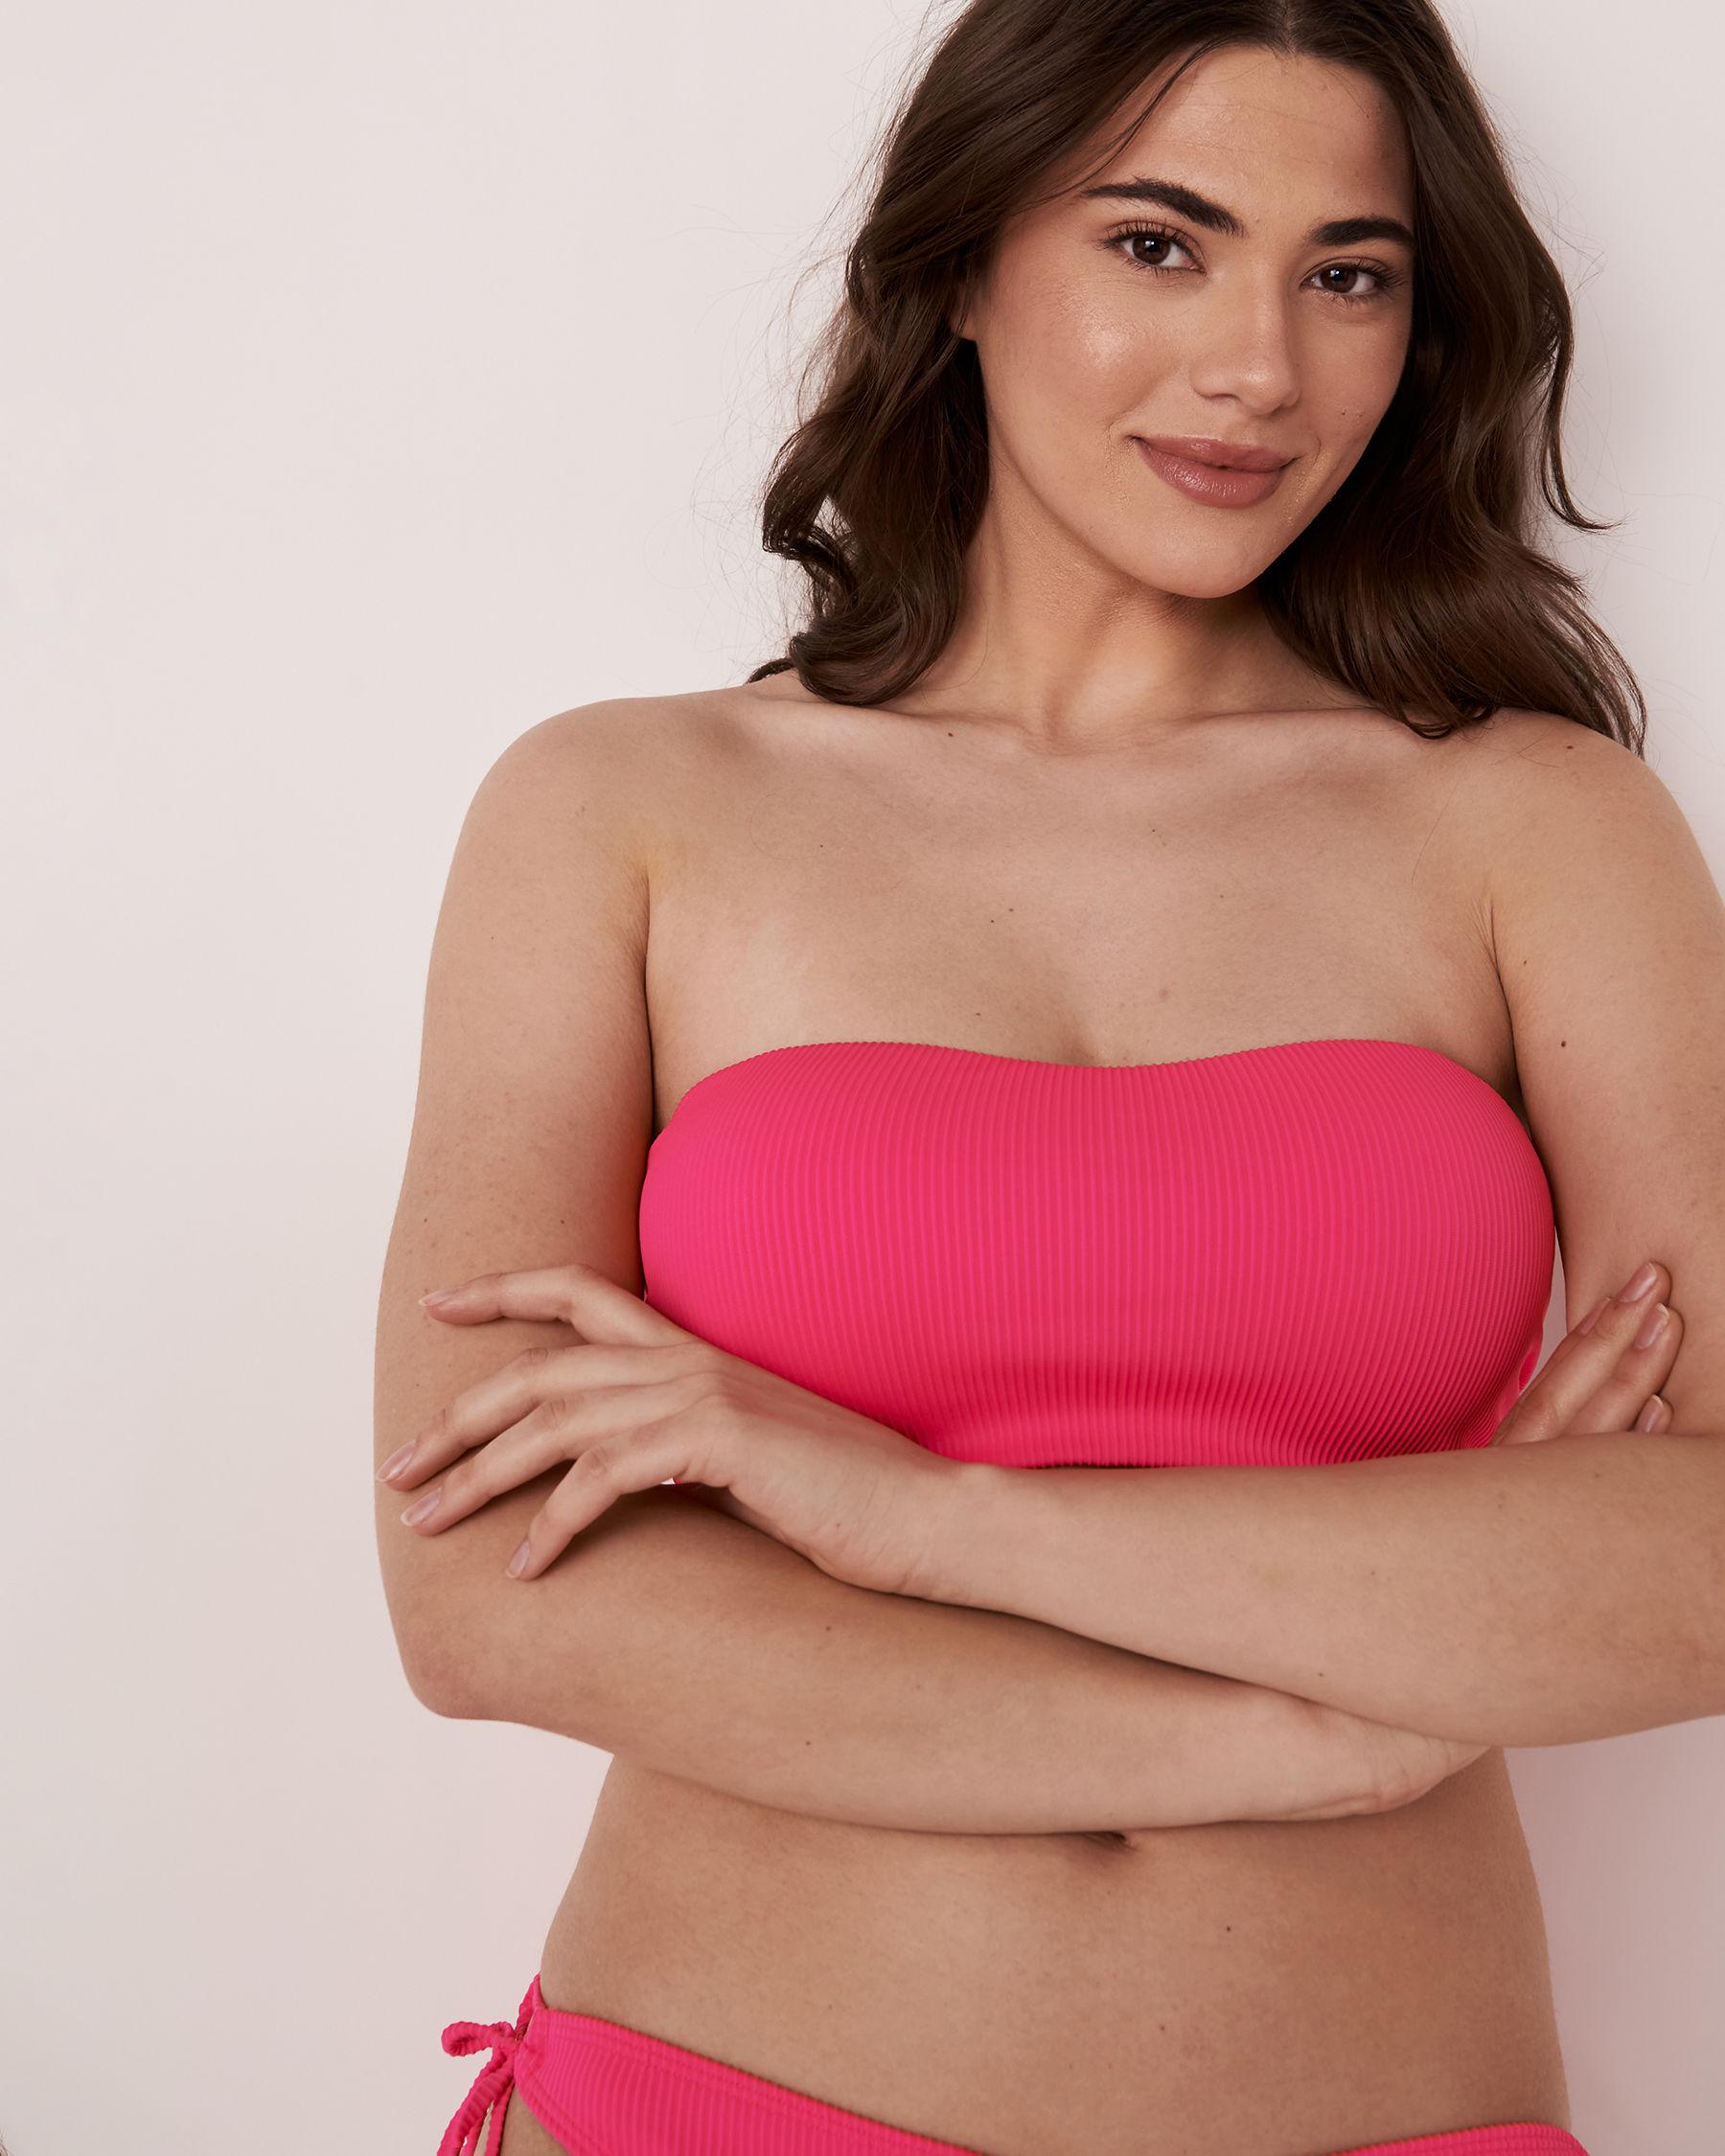 LA VIE EN ROSE AQUA TOOTSIE RIB Recycled Fibers D Cup Bandeau Bikini Top Neon pink 70200010 - View1